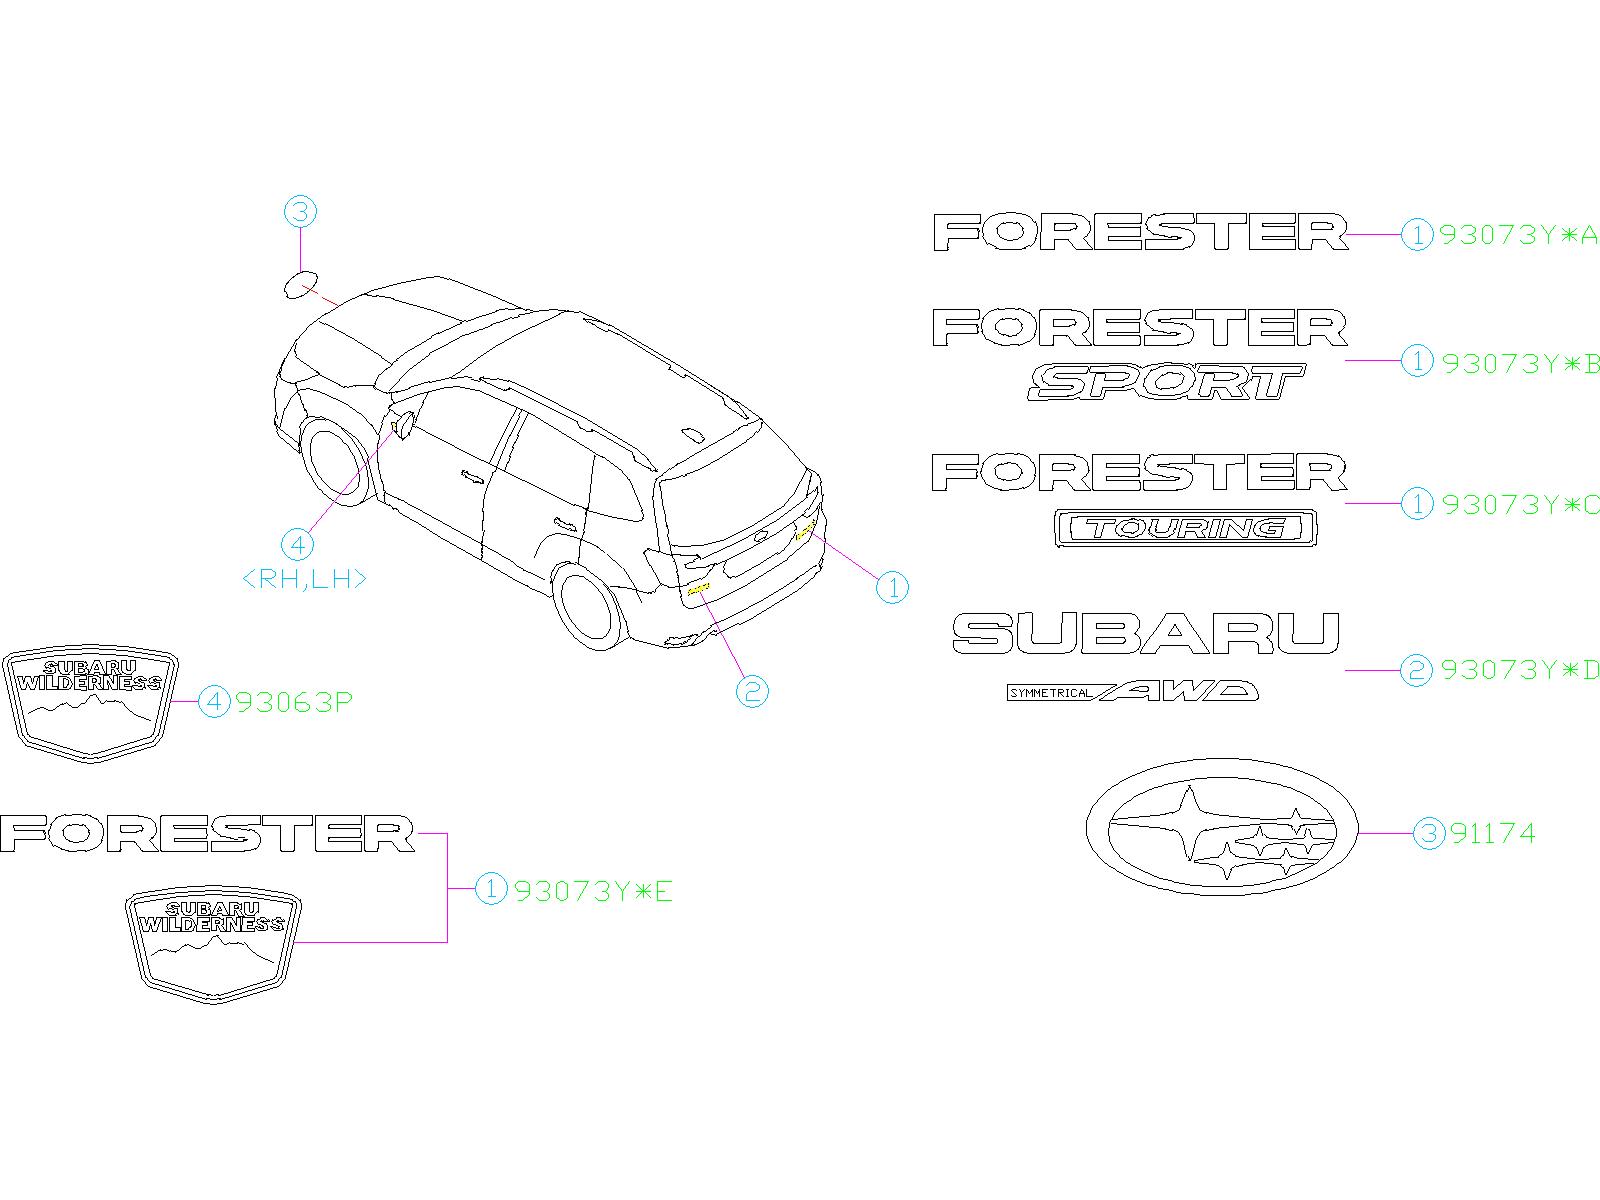 Subaru Forester Letter mark. Letter mk r. (rear). Forester